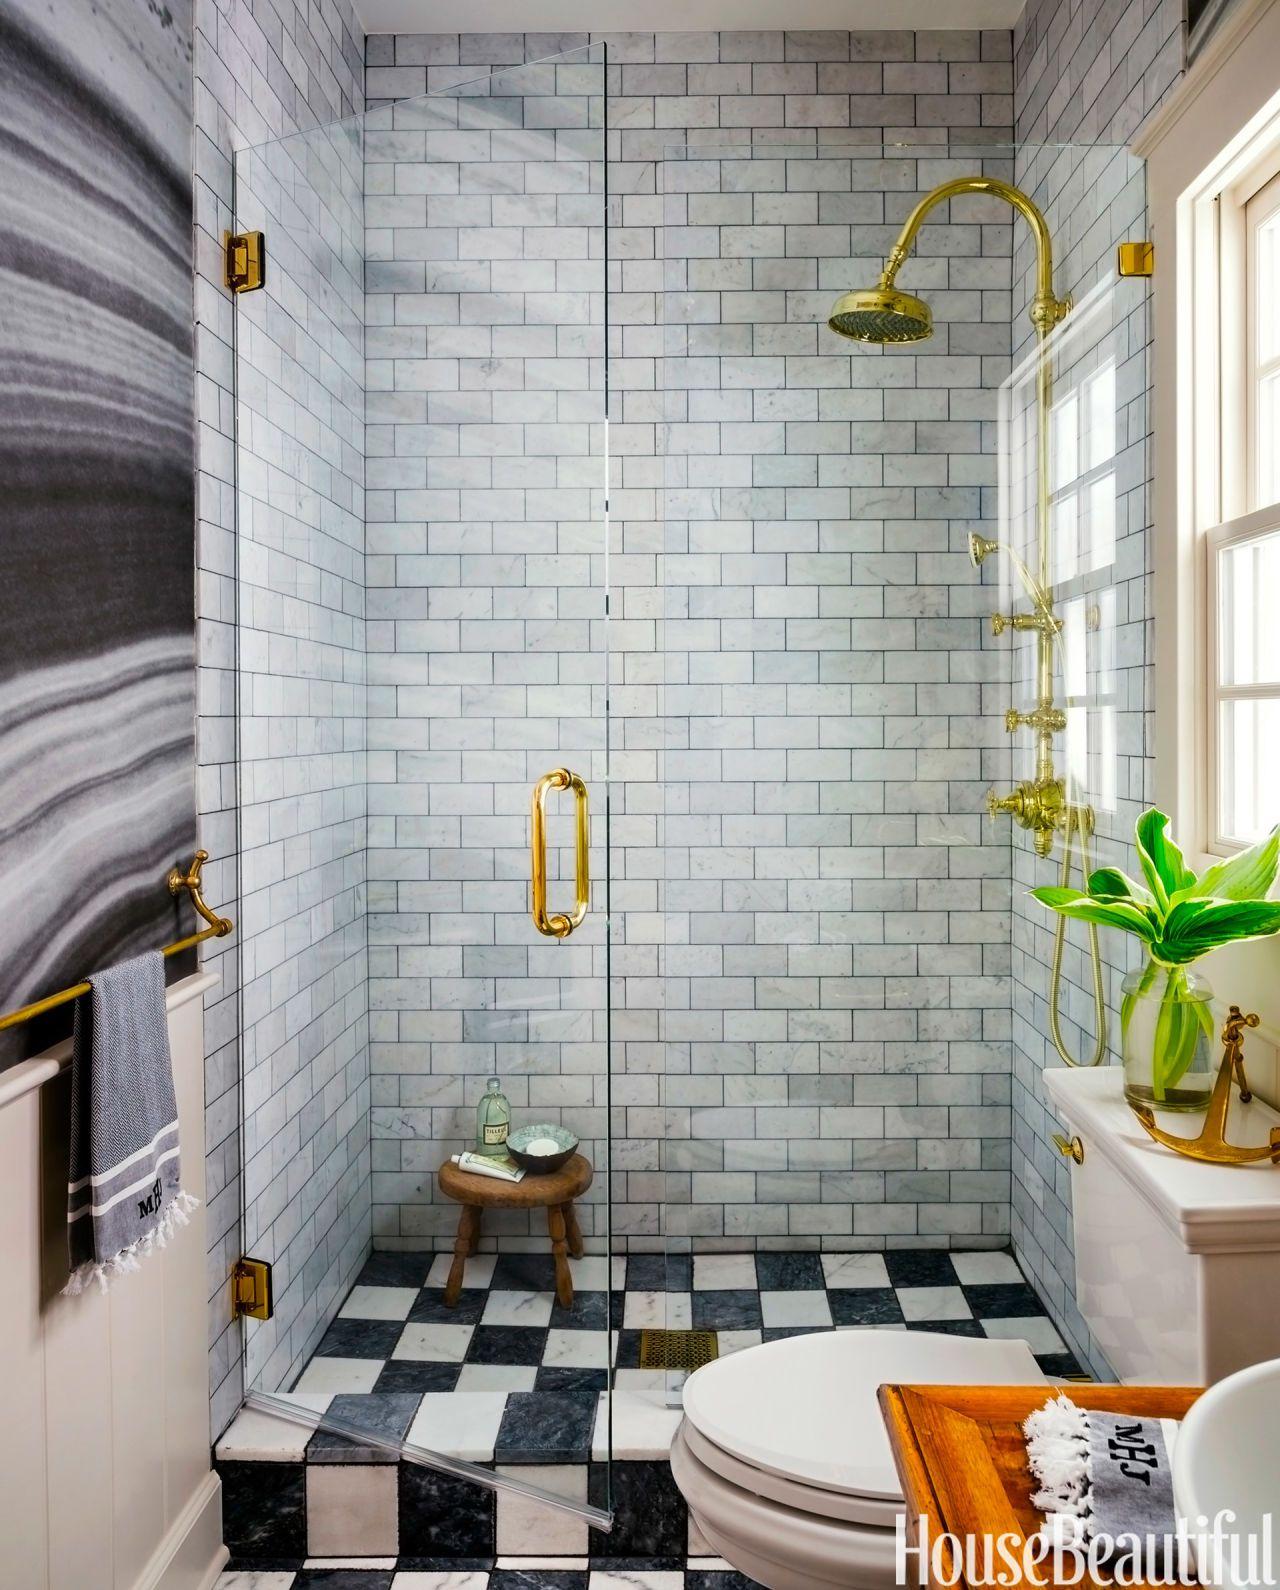 25 small bathroom design ideas - small bathroom solutions DEILFRP